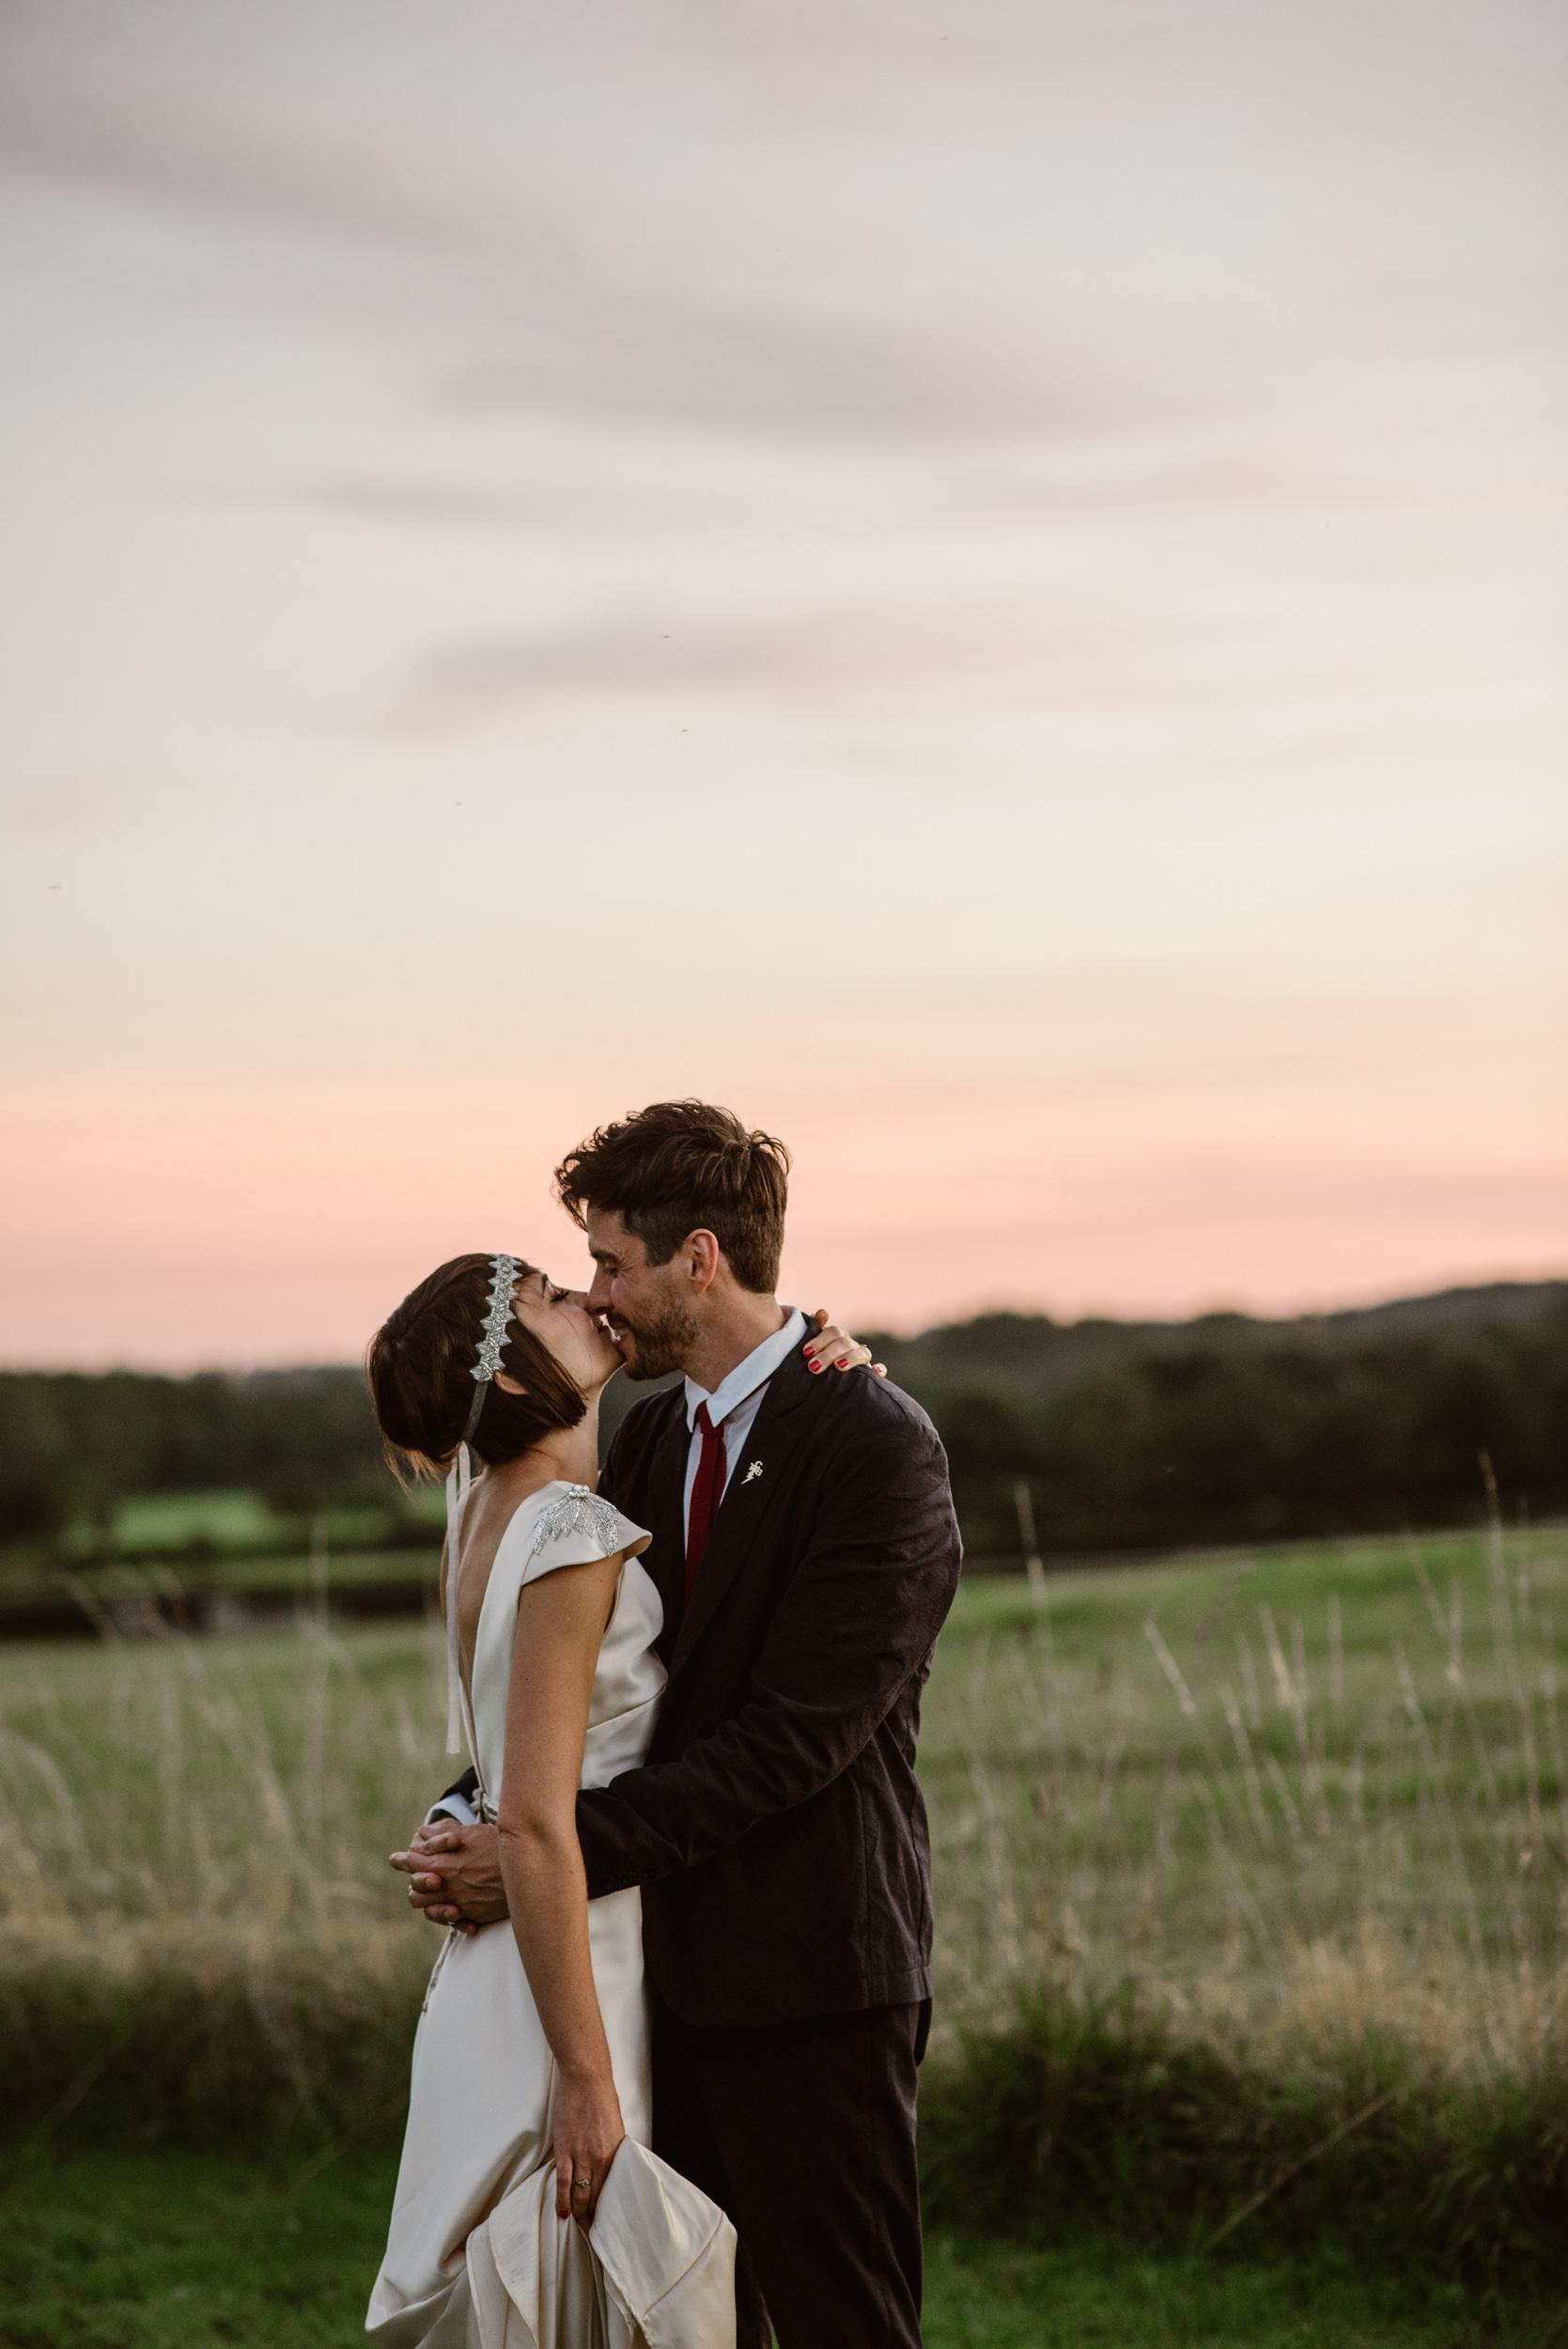 Ro-Kate-Beaumont-bias-cut-silk-wedding-gown-back-garden-wedding-by-Ellie-Gillard-28.jpg